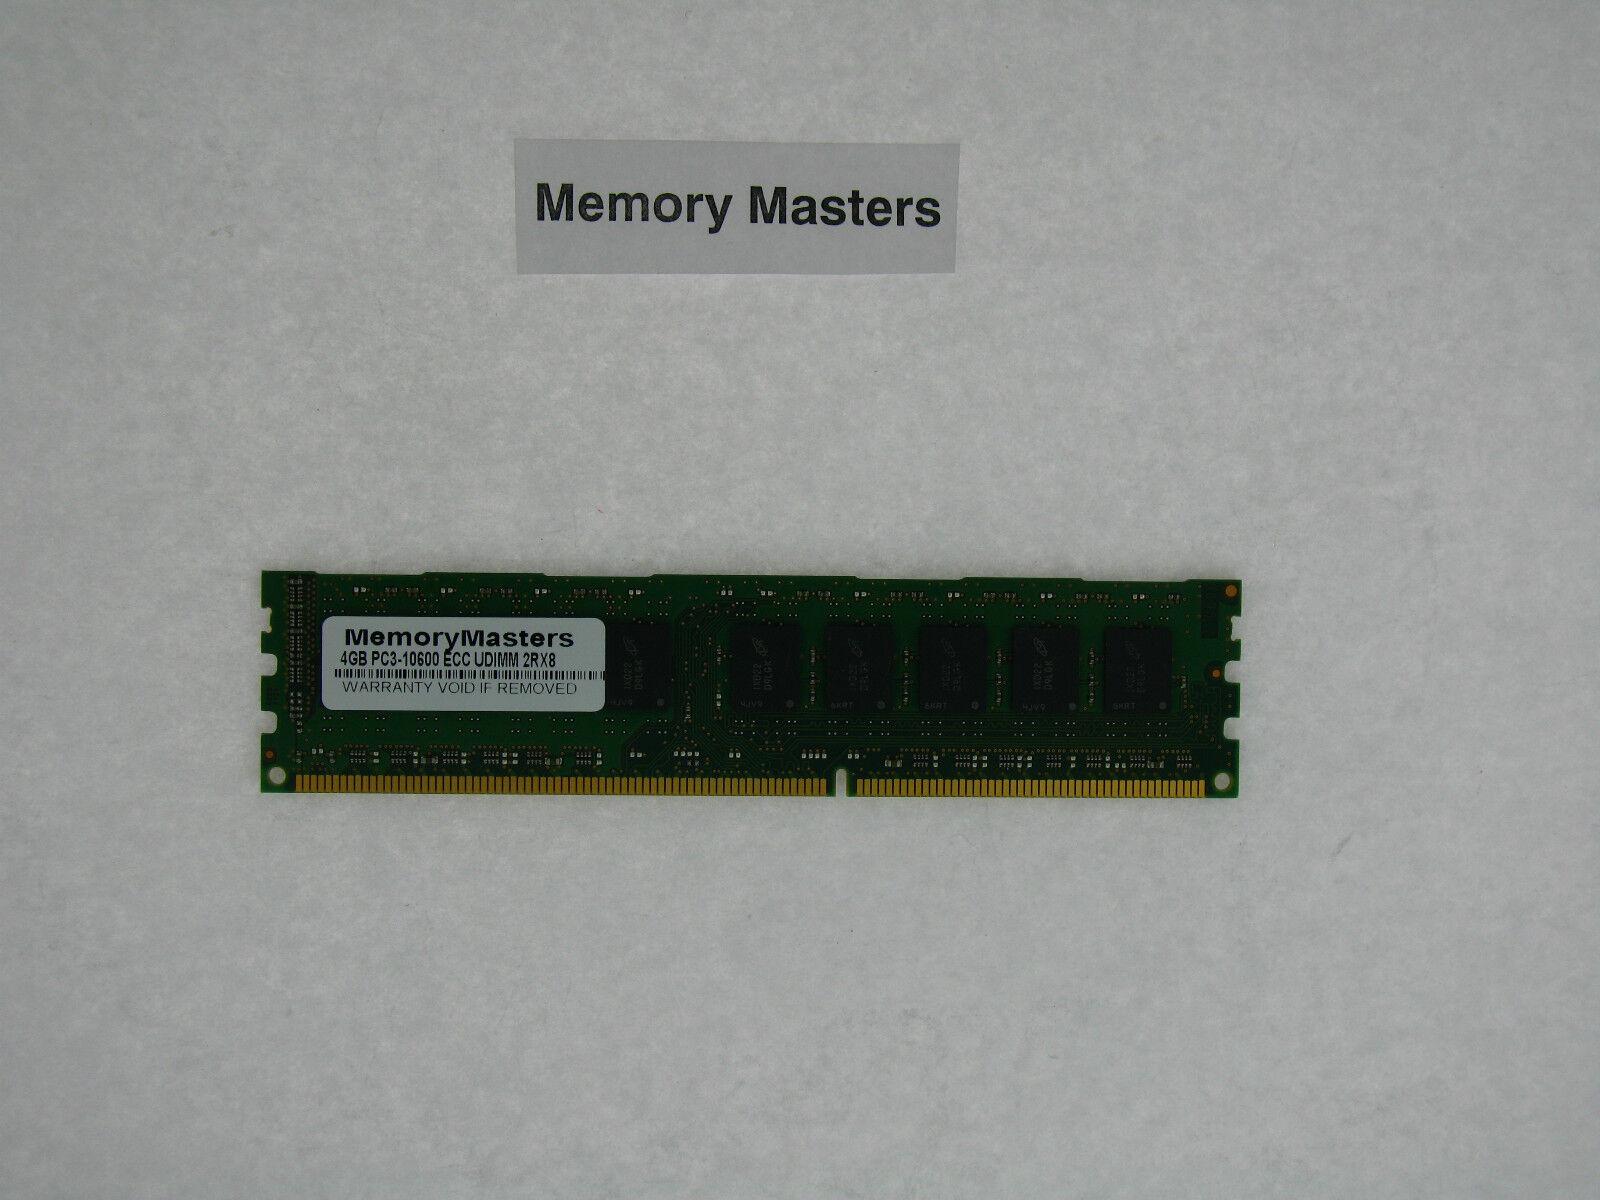 DL180 G6 DL320 G6 604504-B21 4GB DDR3 1333MHz Memory HP ProLiant  DL160 G6